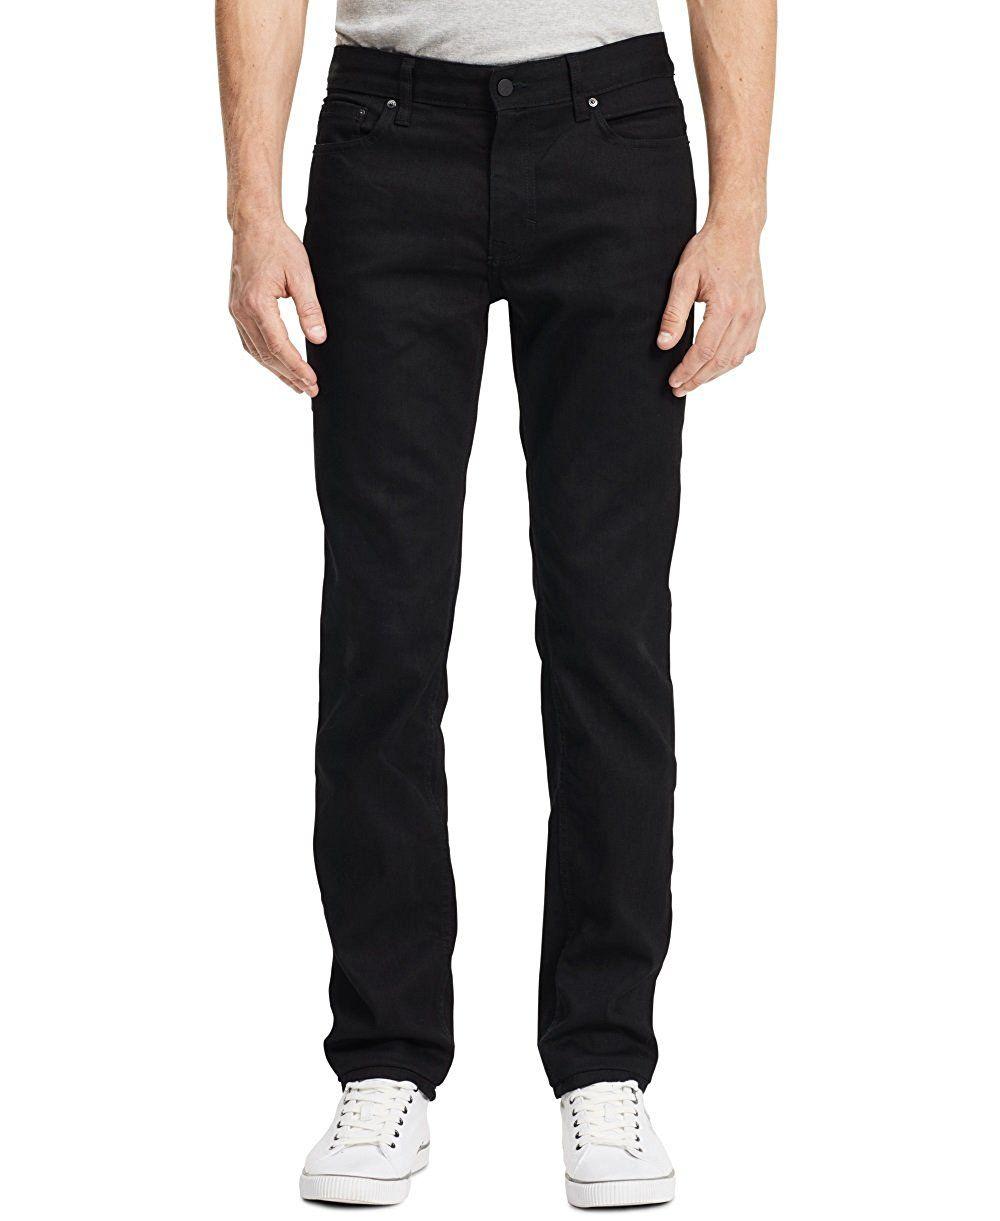 c81c3900a436e Calvin Klein Men s Slim Straight Fit Seasonal Denim Jean at Amazon Men s  Clothing store